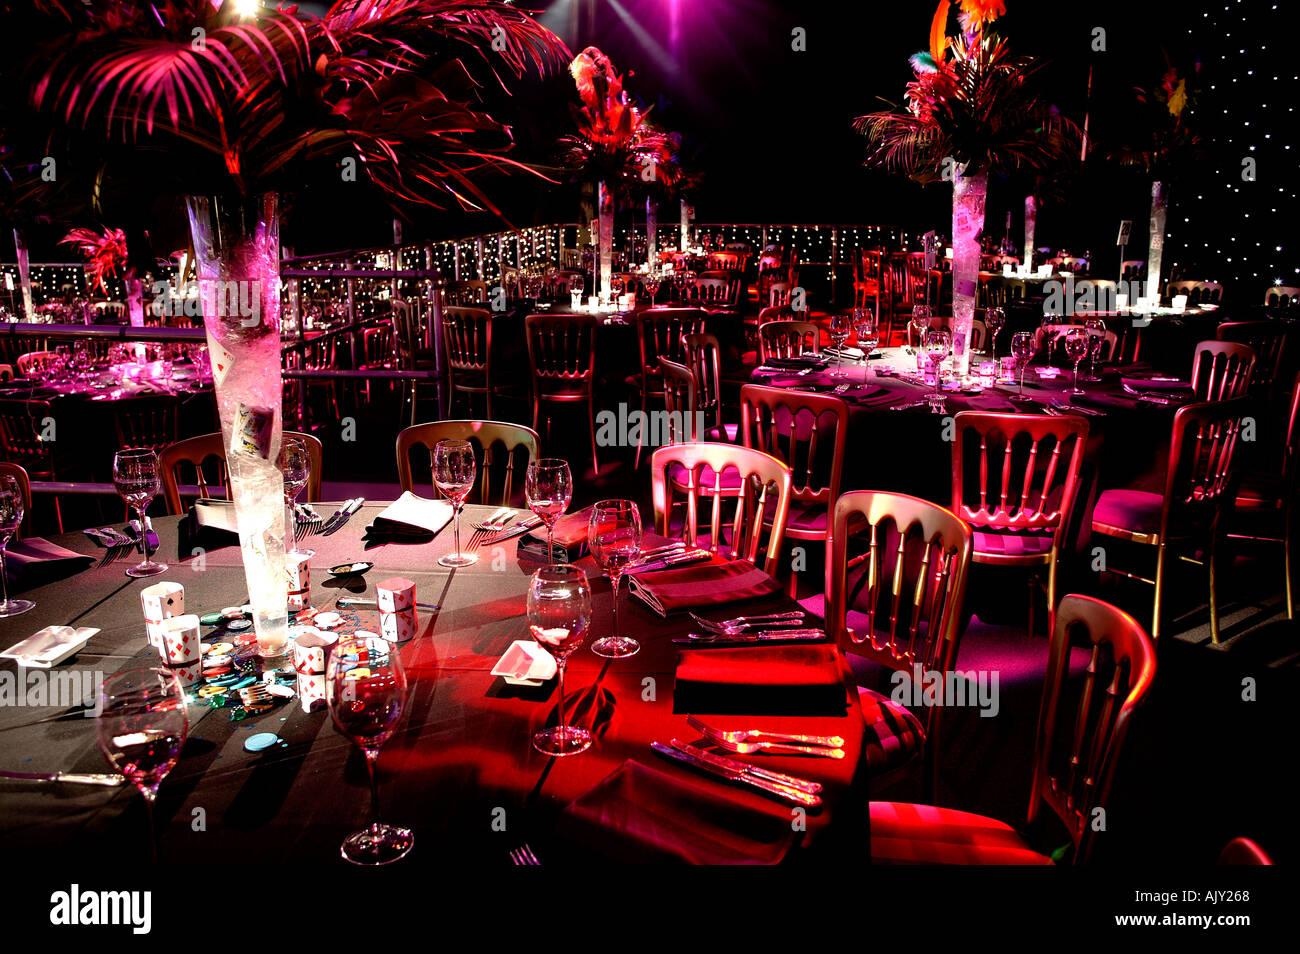 Party venue - Stock Image